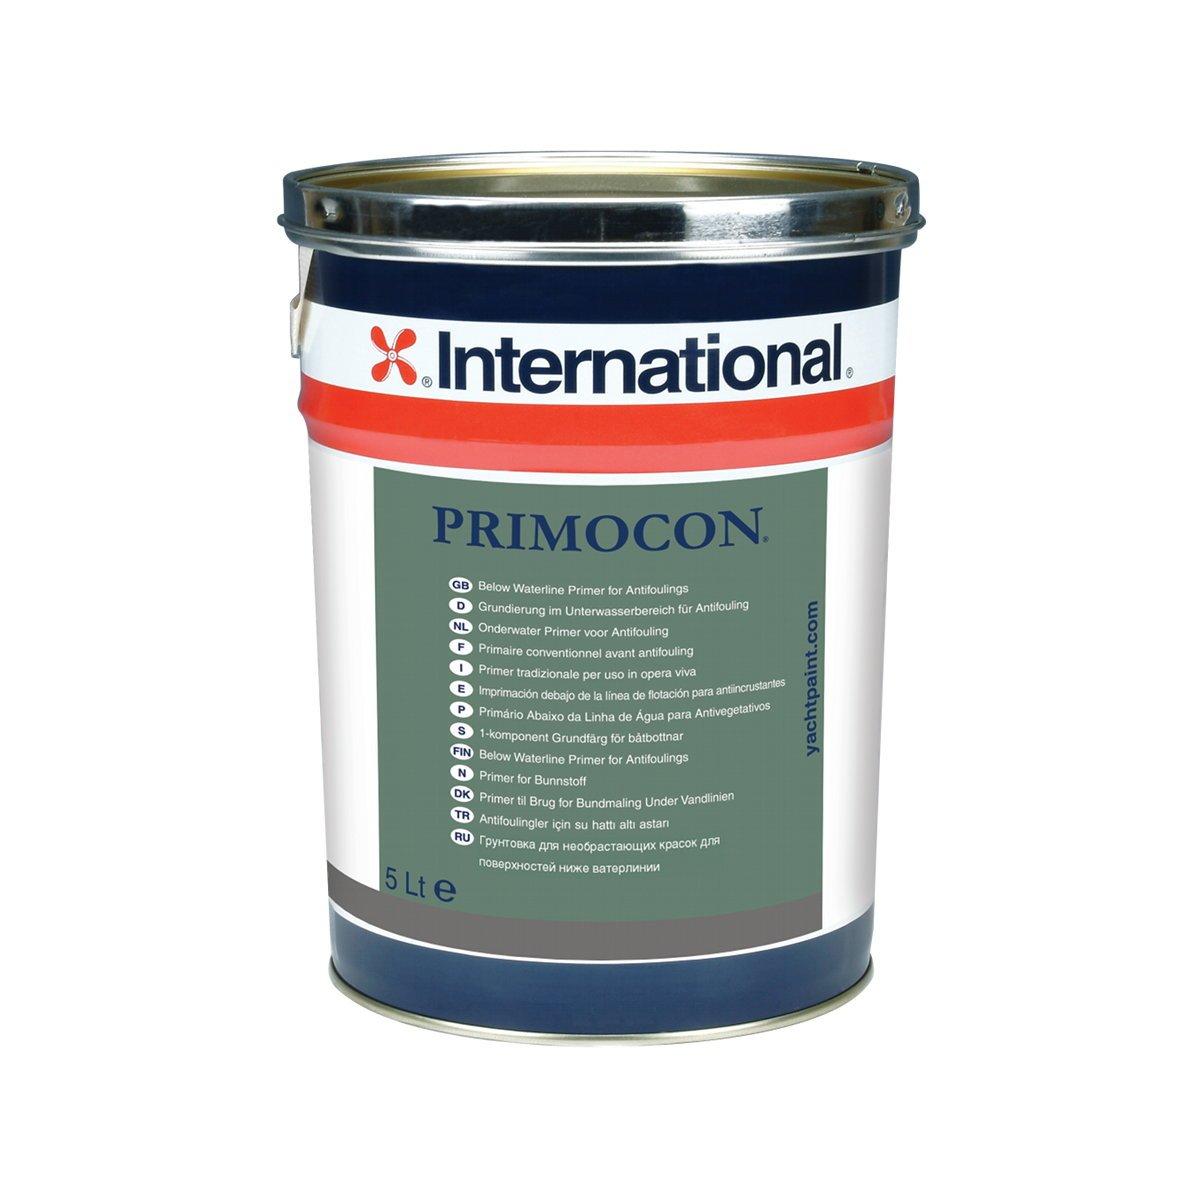 International Primocon Talla:5 L